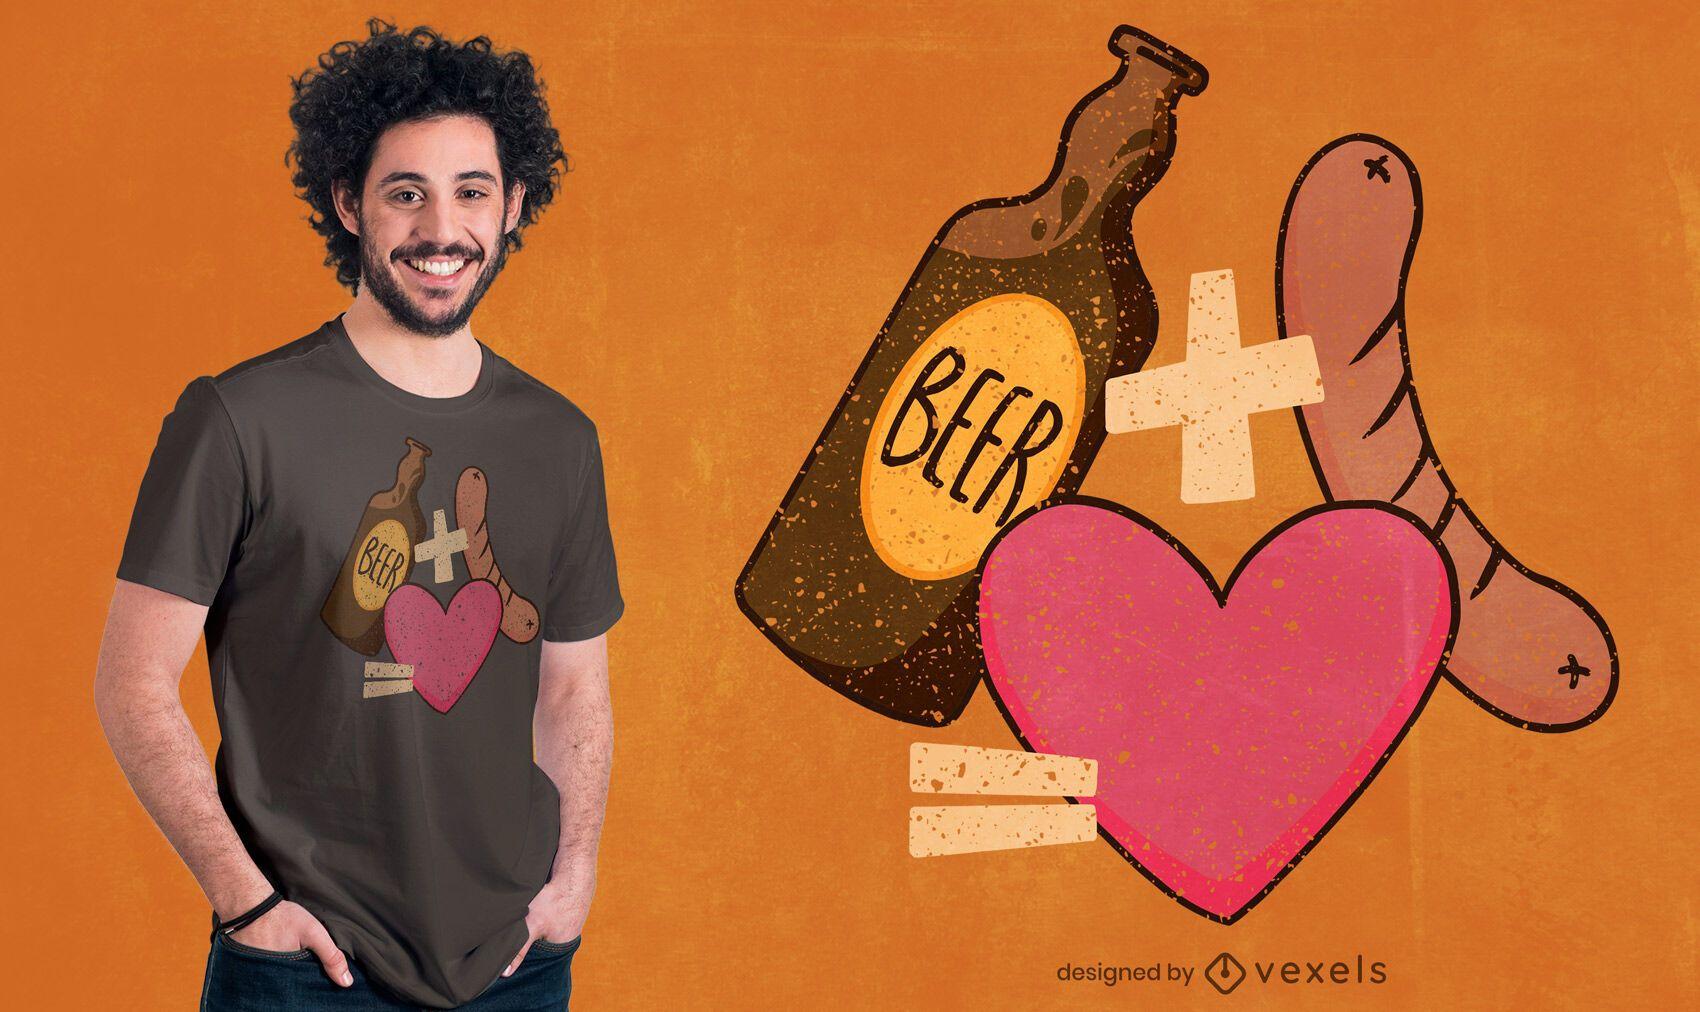 Beer sausage love t-shirt design